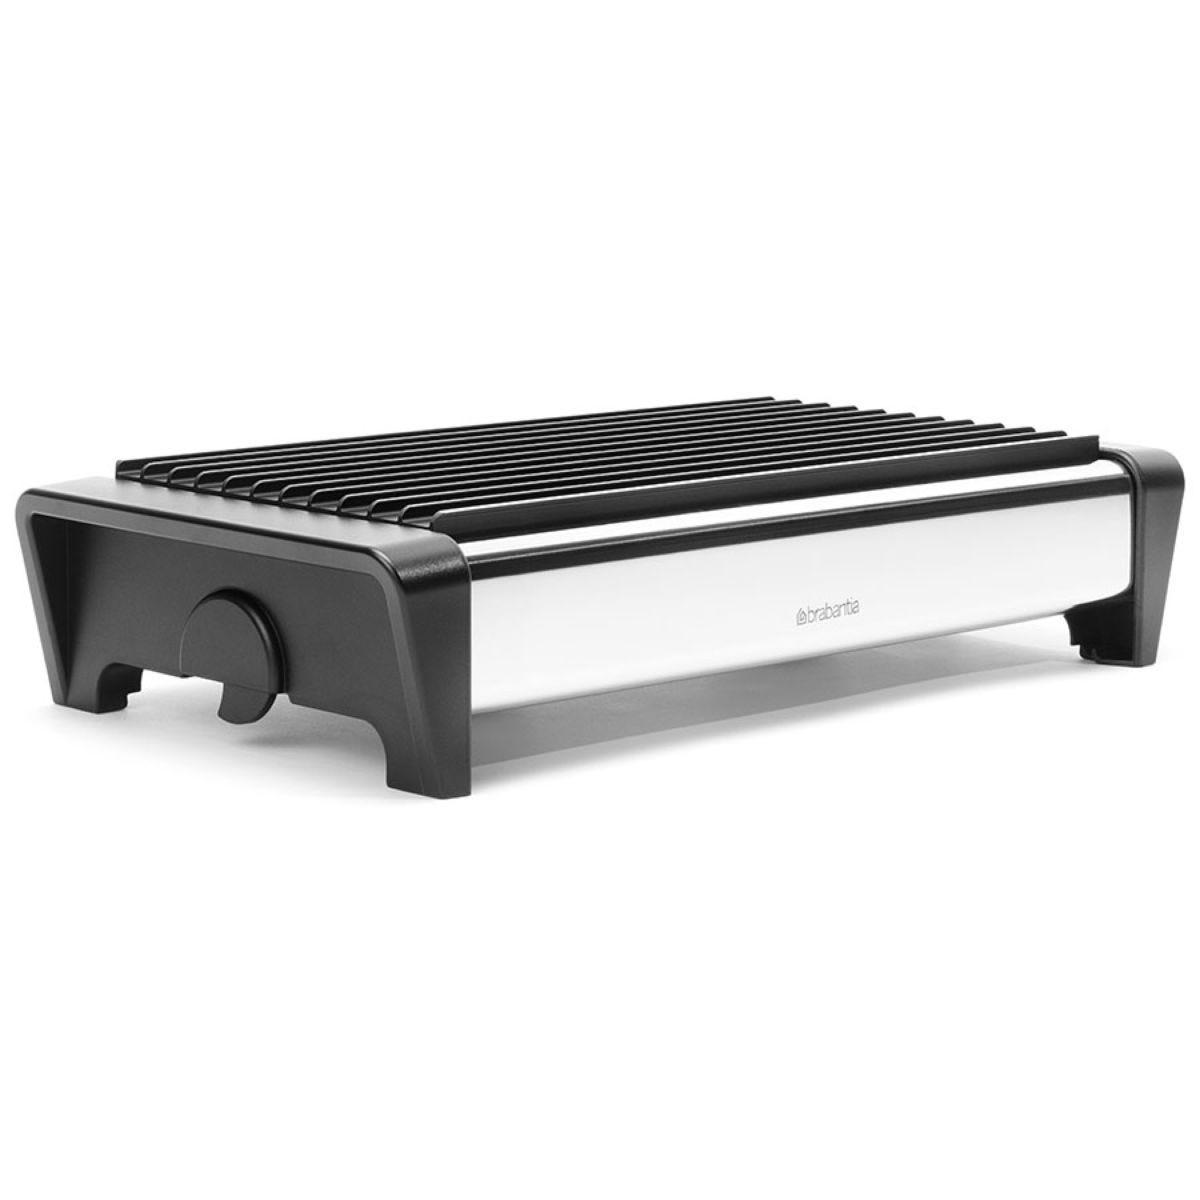 Brabantia 2 burner Food Warmer - Brilliant Steel / Black